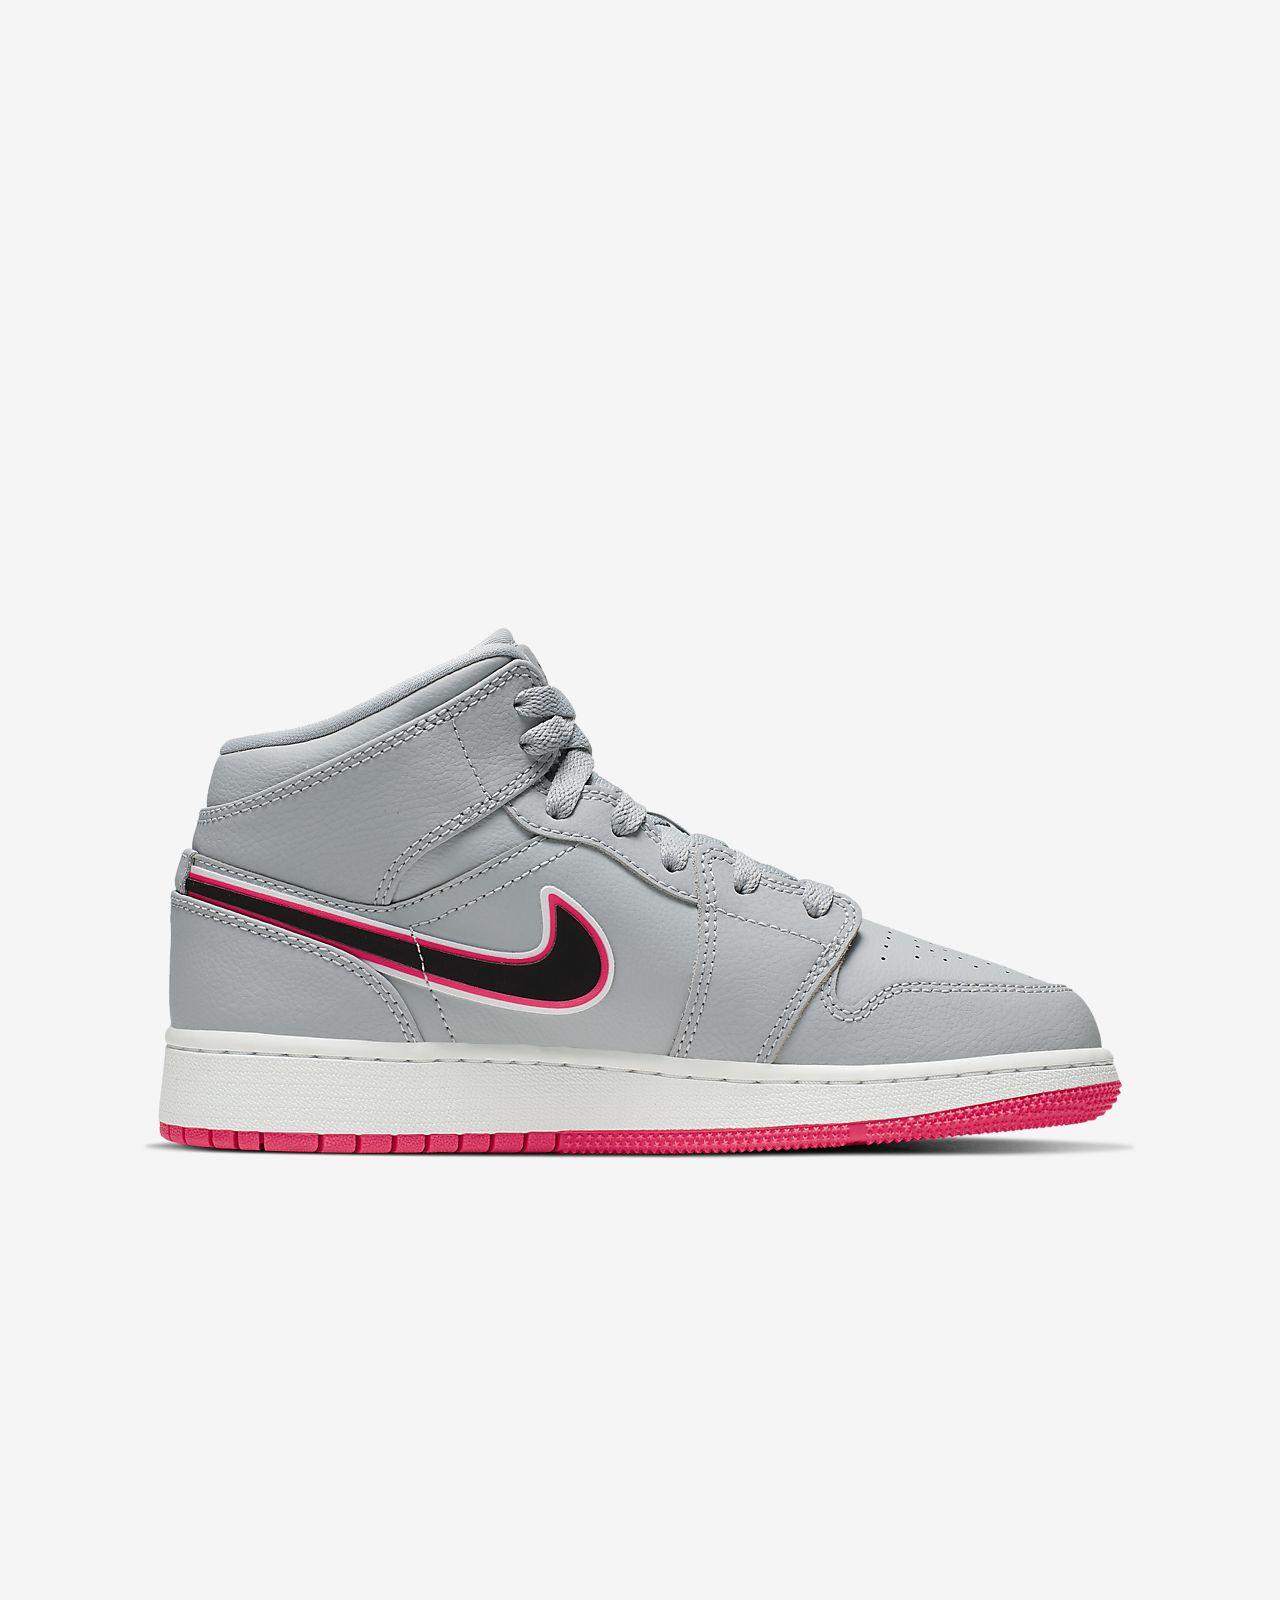 low priced e1e39 a6266 Air Jordan 1 Mid Big Kids' Shoe